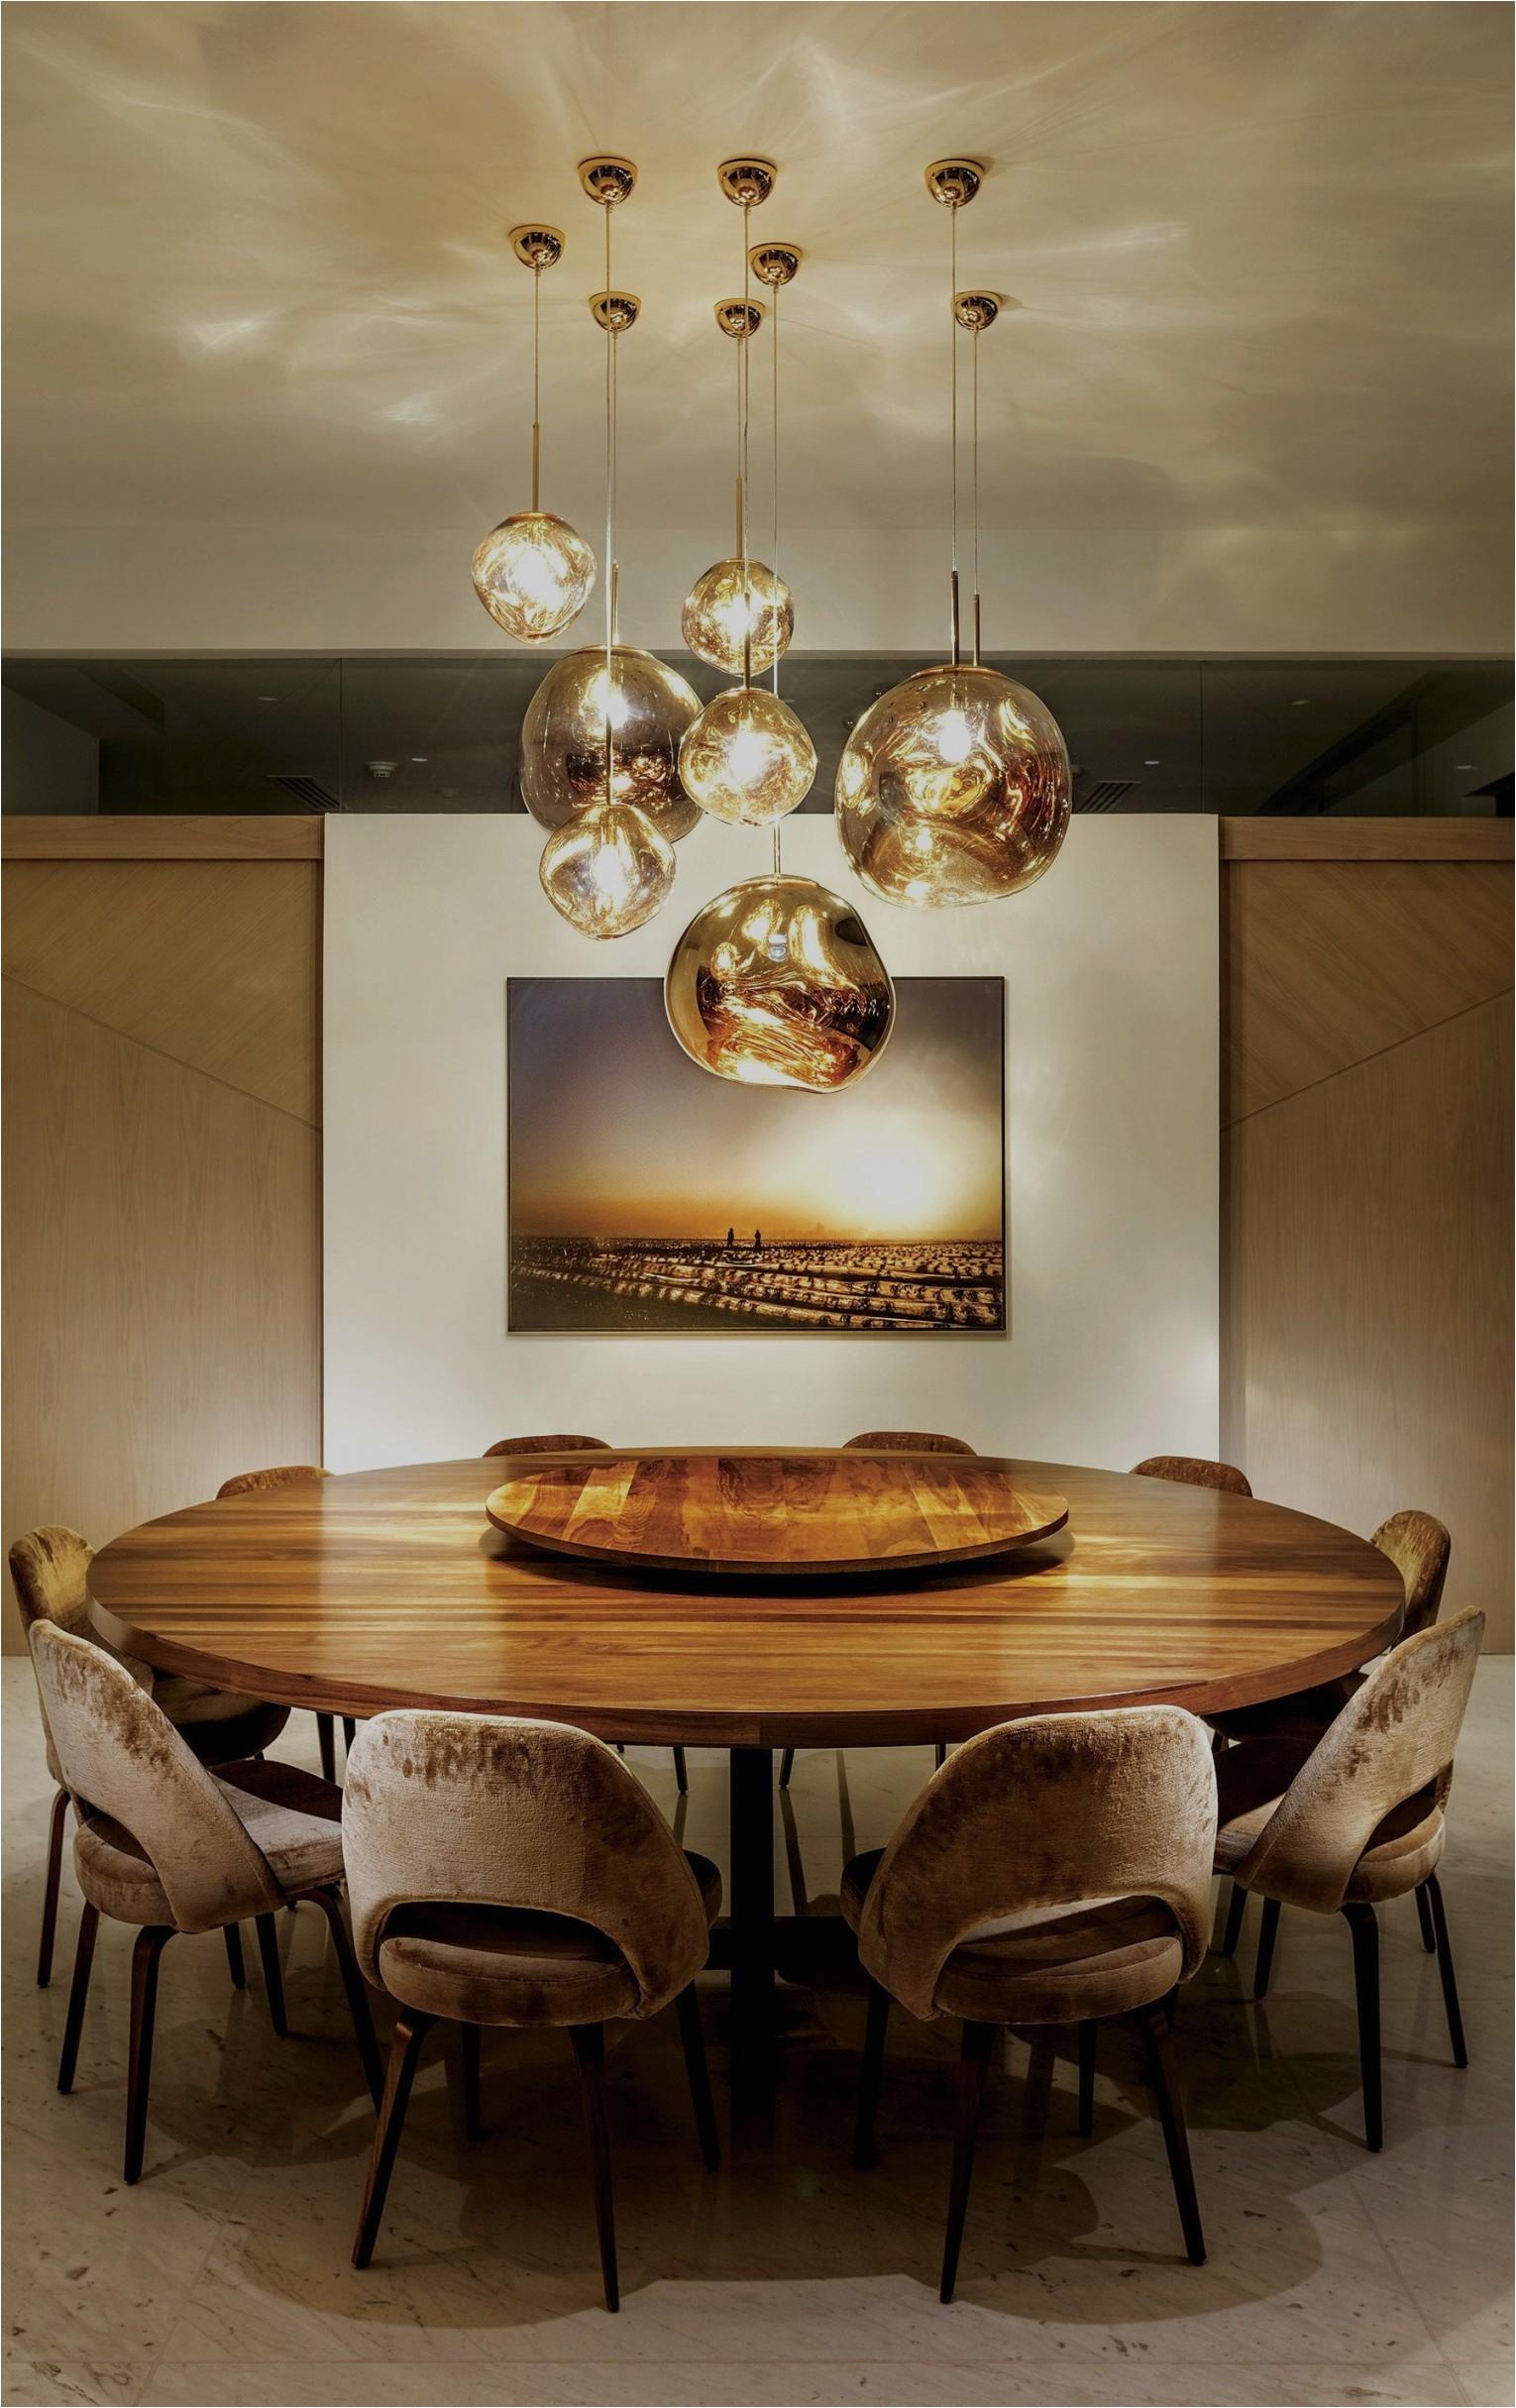 Chandelier Dining Room Ideas Best Costco 18 Light Chandelier Inspirational Lighting Lighting 0d